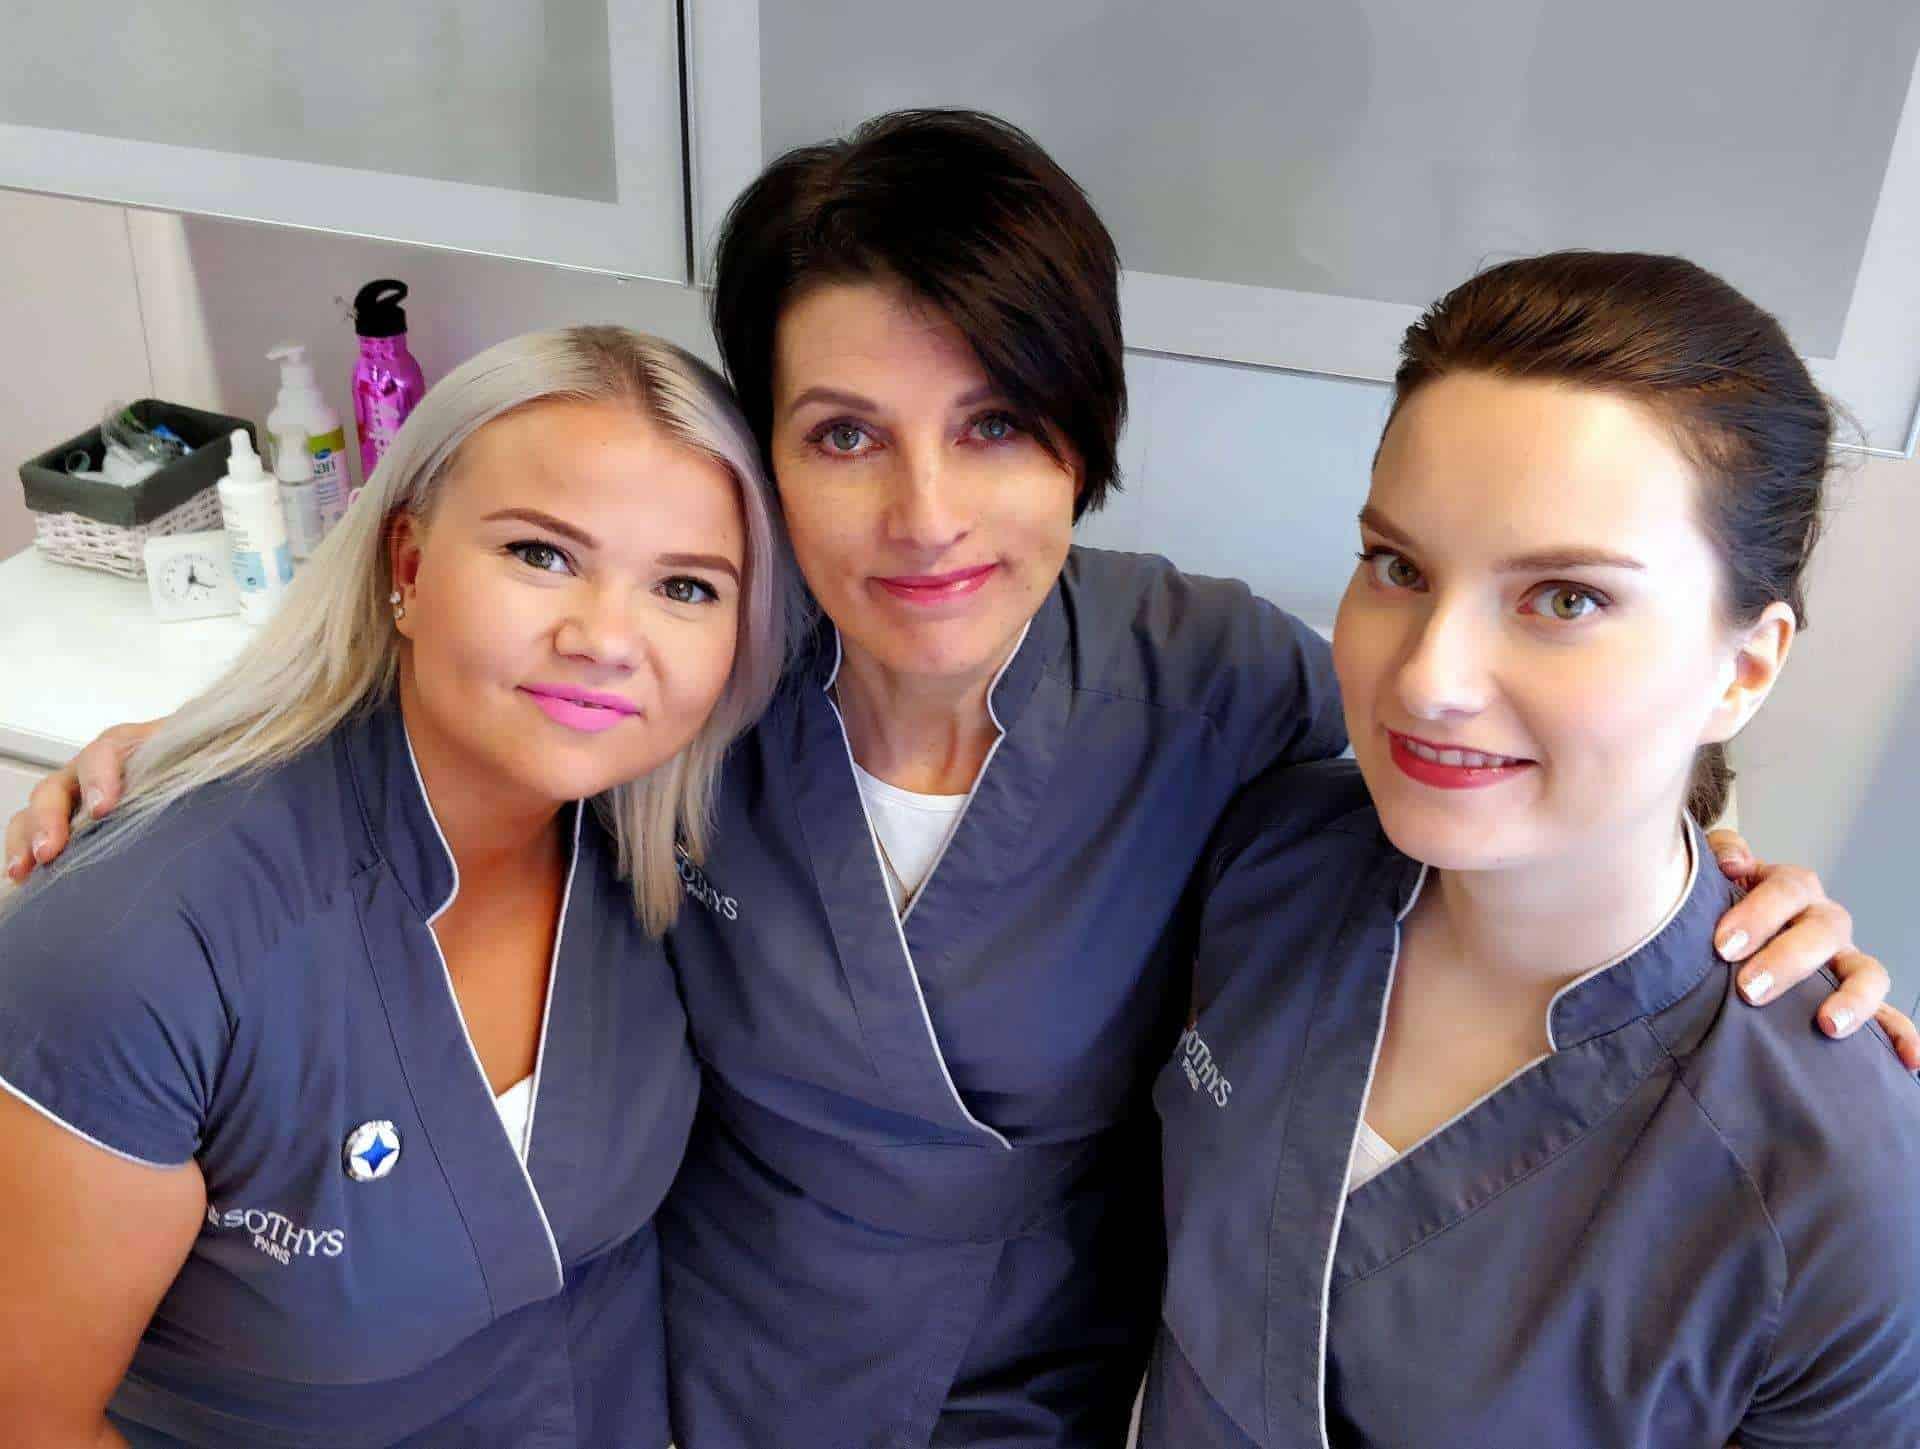 Kauneushoitola BellaHelena Oulu tiimi: SKY Helena Tauriainen, SKY Emma Kaasalainen, SKY Oona Shnoro